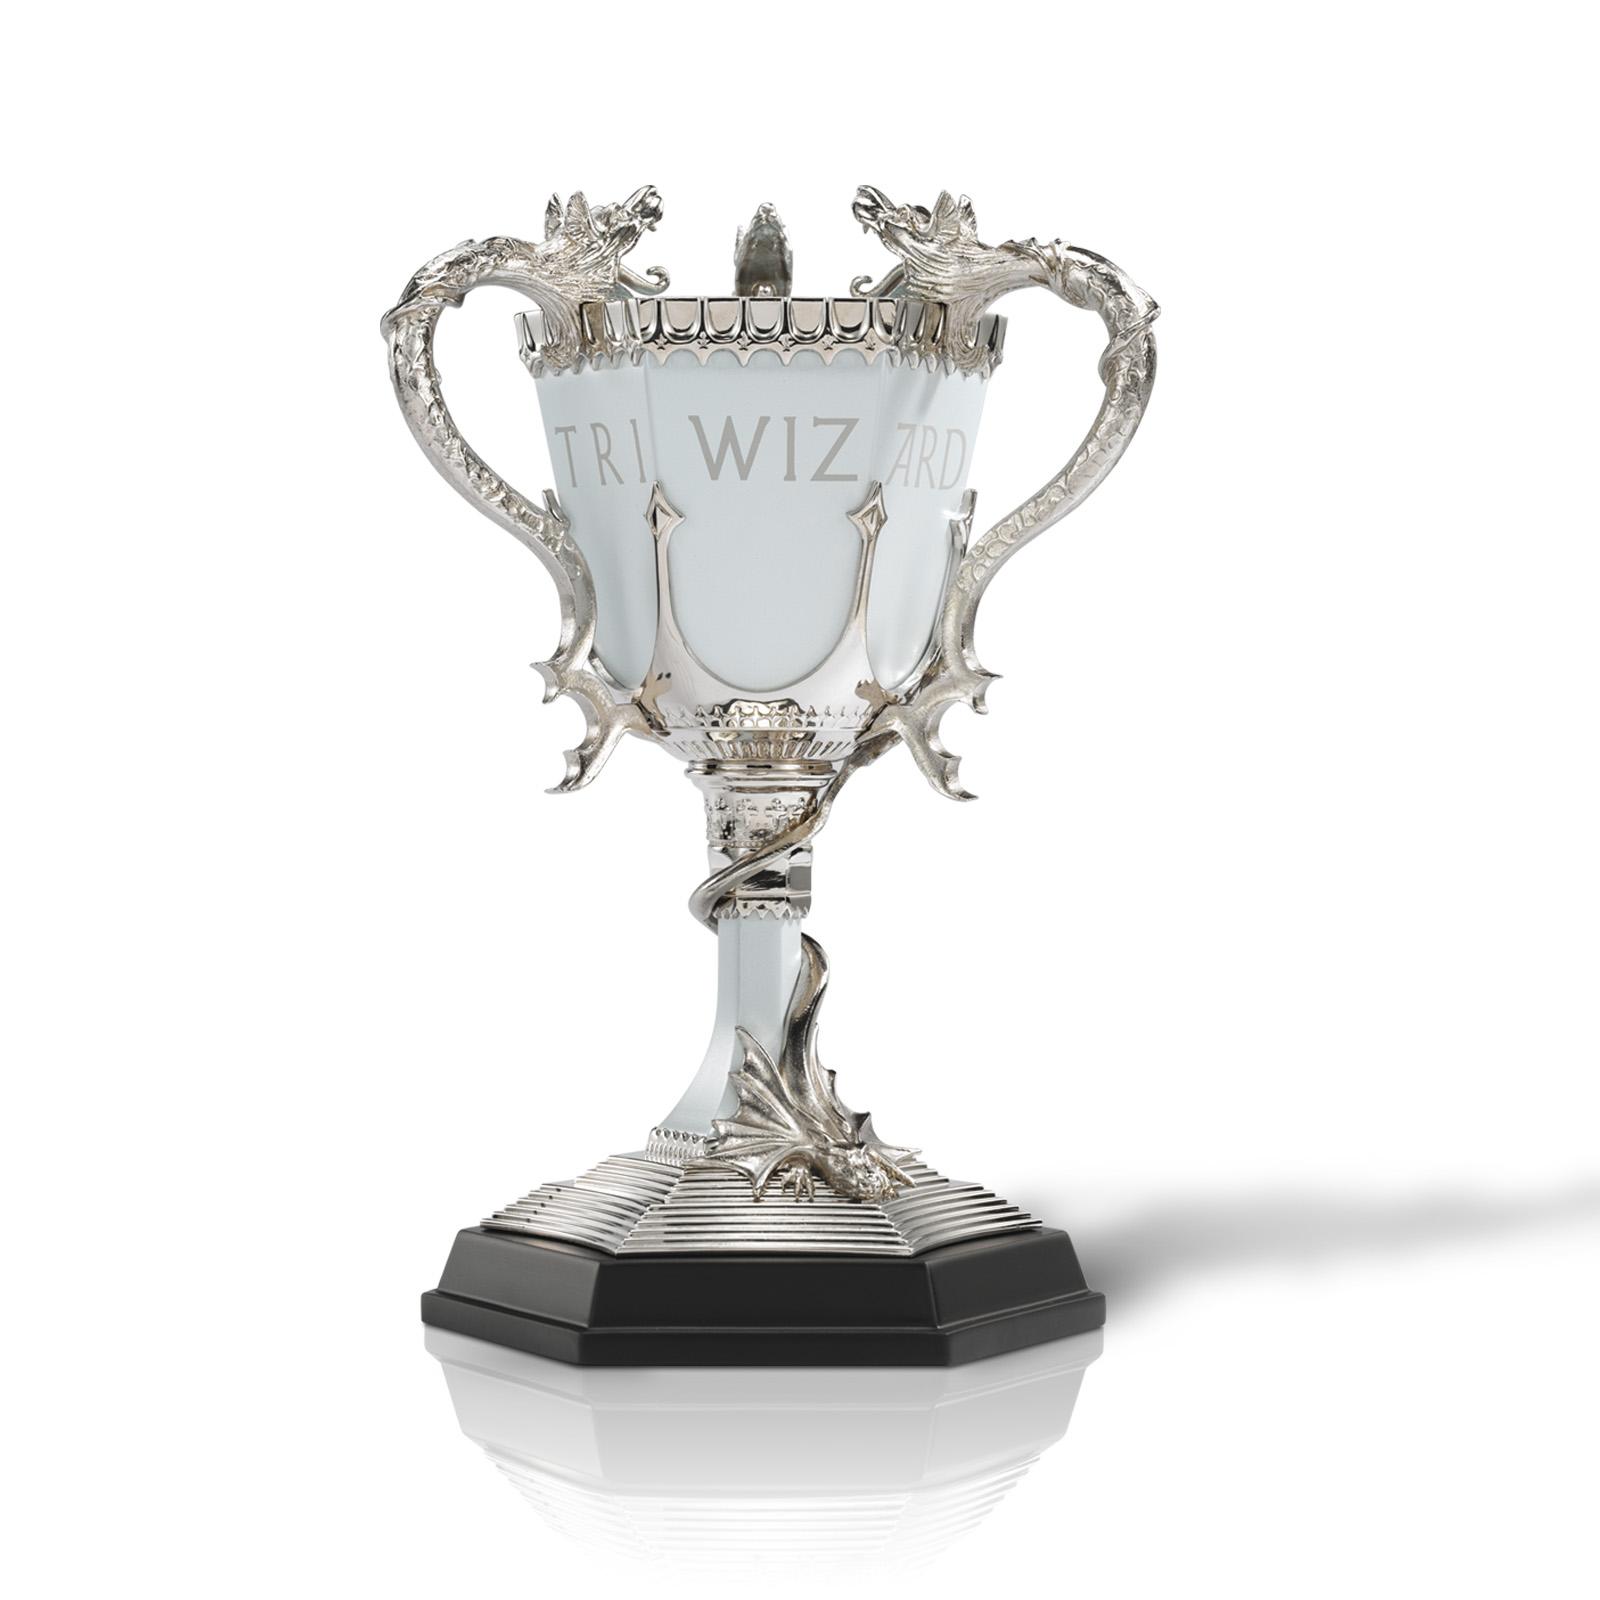 Der Trimagische Pokal